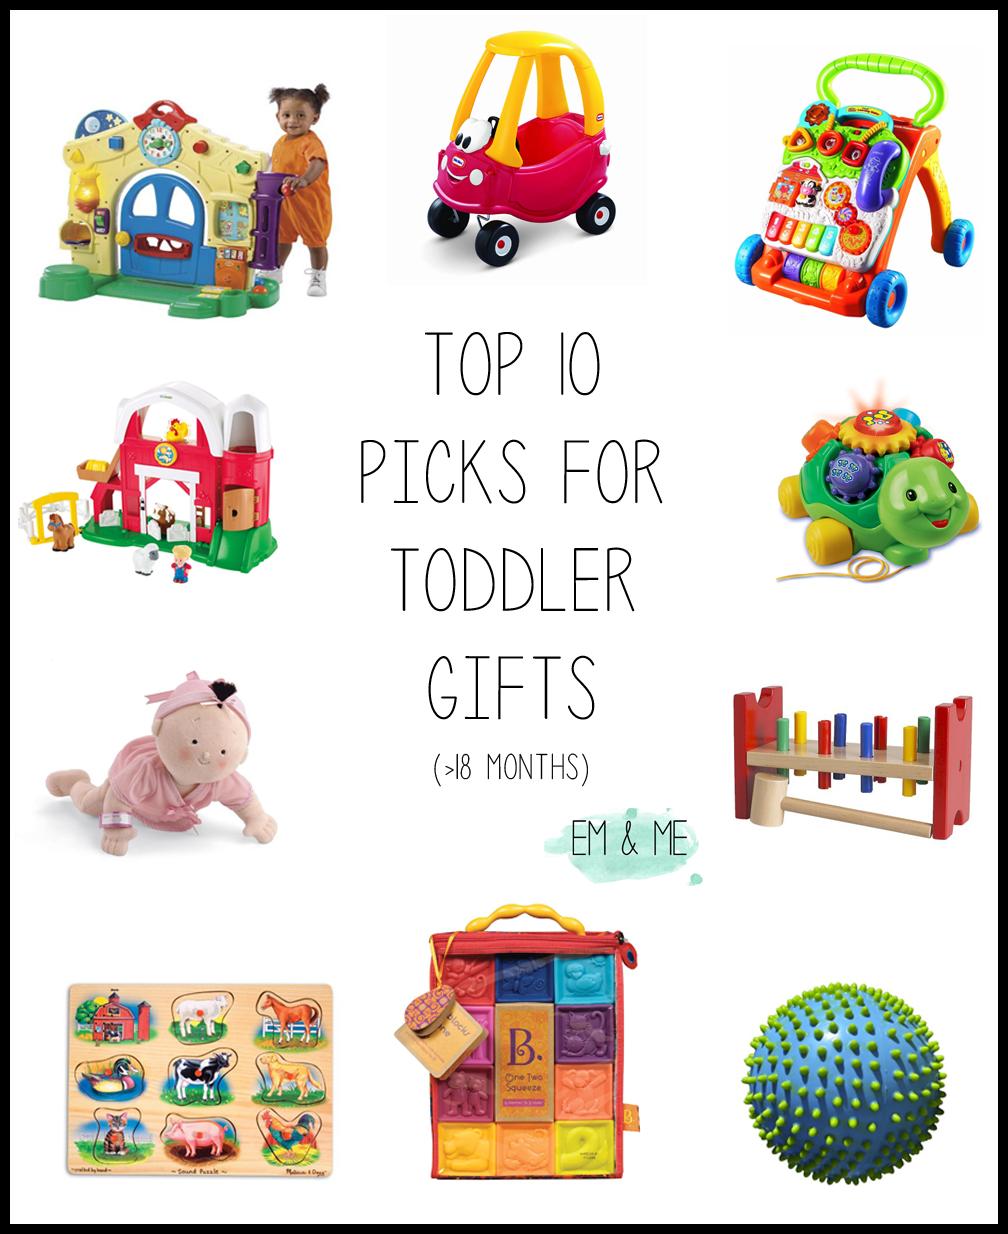 em & me: Mama Monday: Top 10 picks for toddler christmas gifts